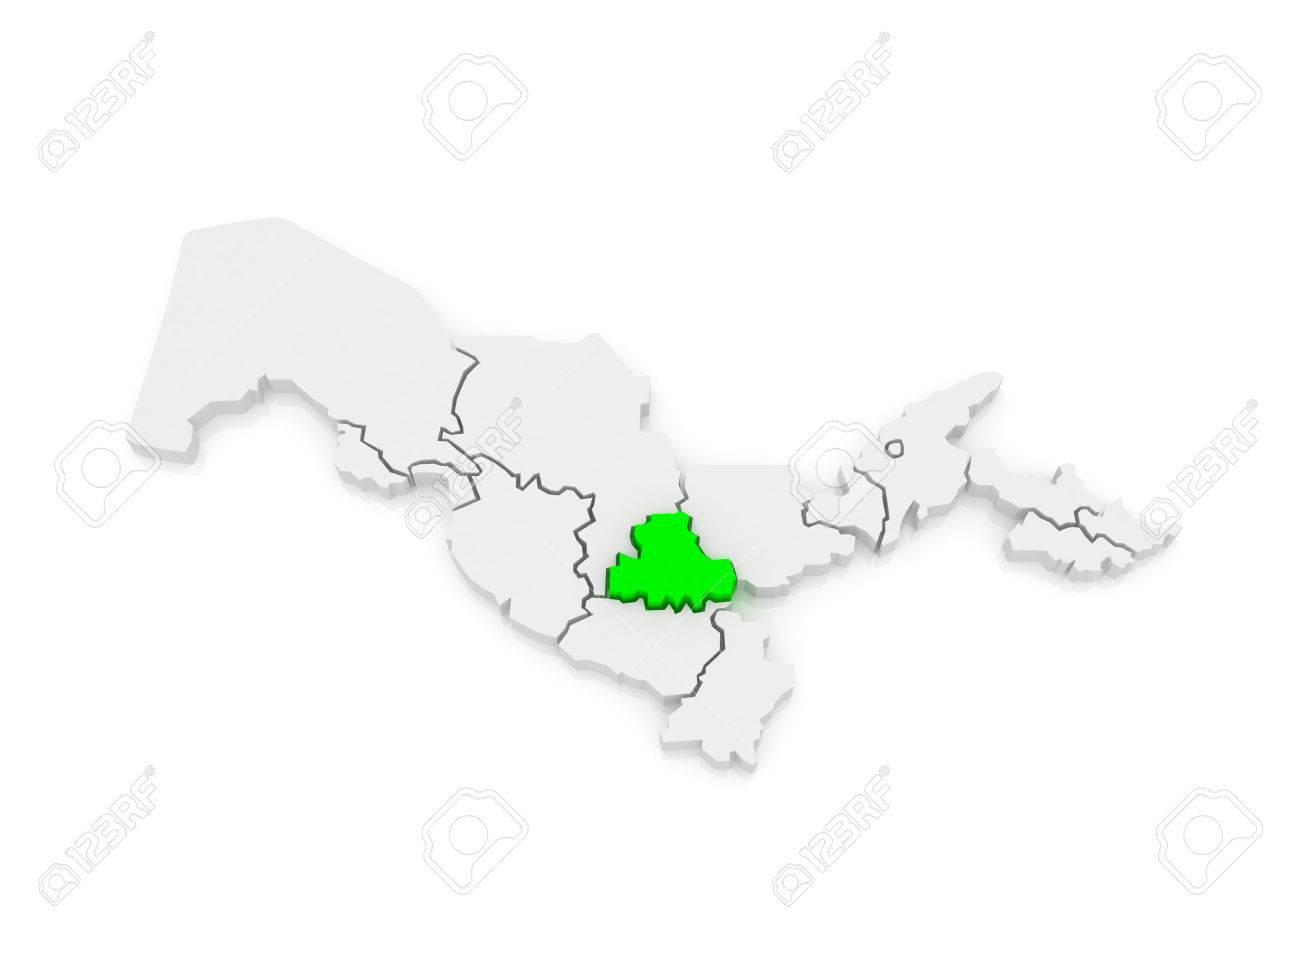 Map of Samarkand region. Uzbekistan. 3d Samarkand Map on damascus map, odessa map, baghdad map, timbuktu map, medina map, kashgar map, indus river map, herat map, singapore map, merv map, tashkent map, central asia map, karakorum map, silk road map, almaty map, oxus river map, urumqi map, uzbekistan map, seville map, rome map,